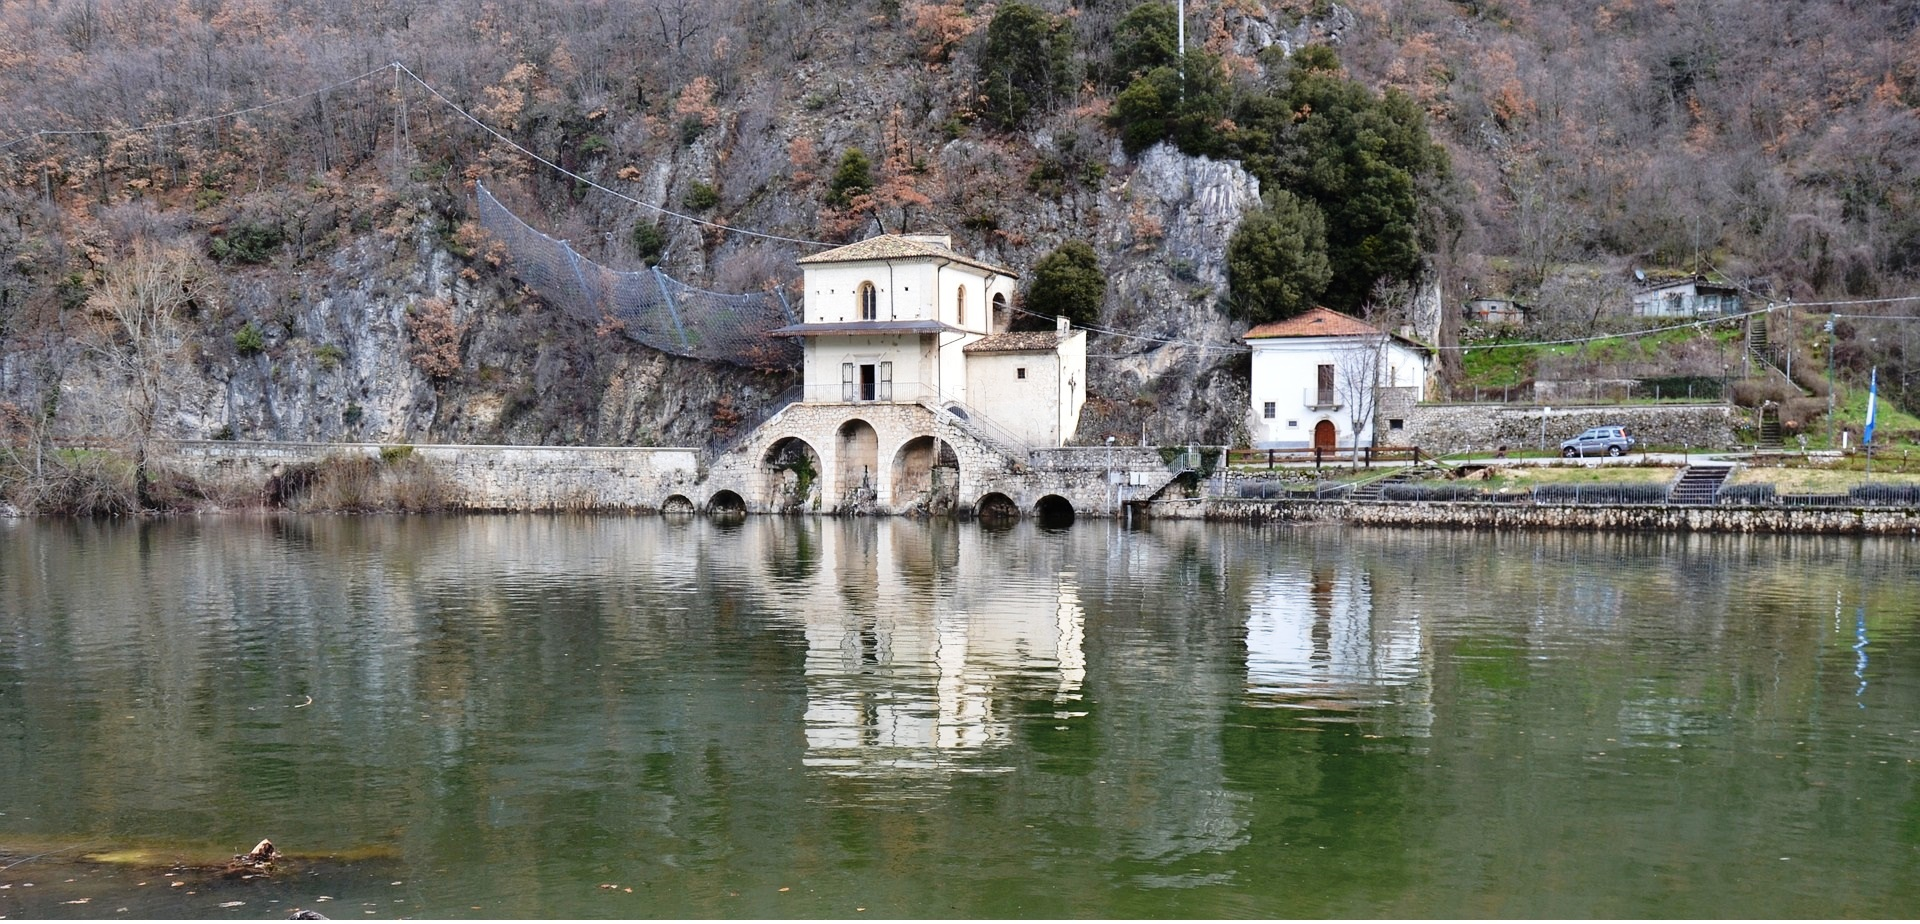 Abruzzo Natural Parks - Scanno1 pix.jpg